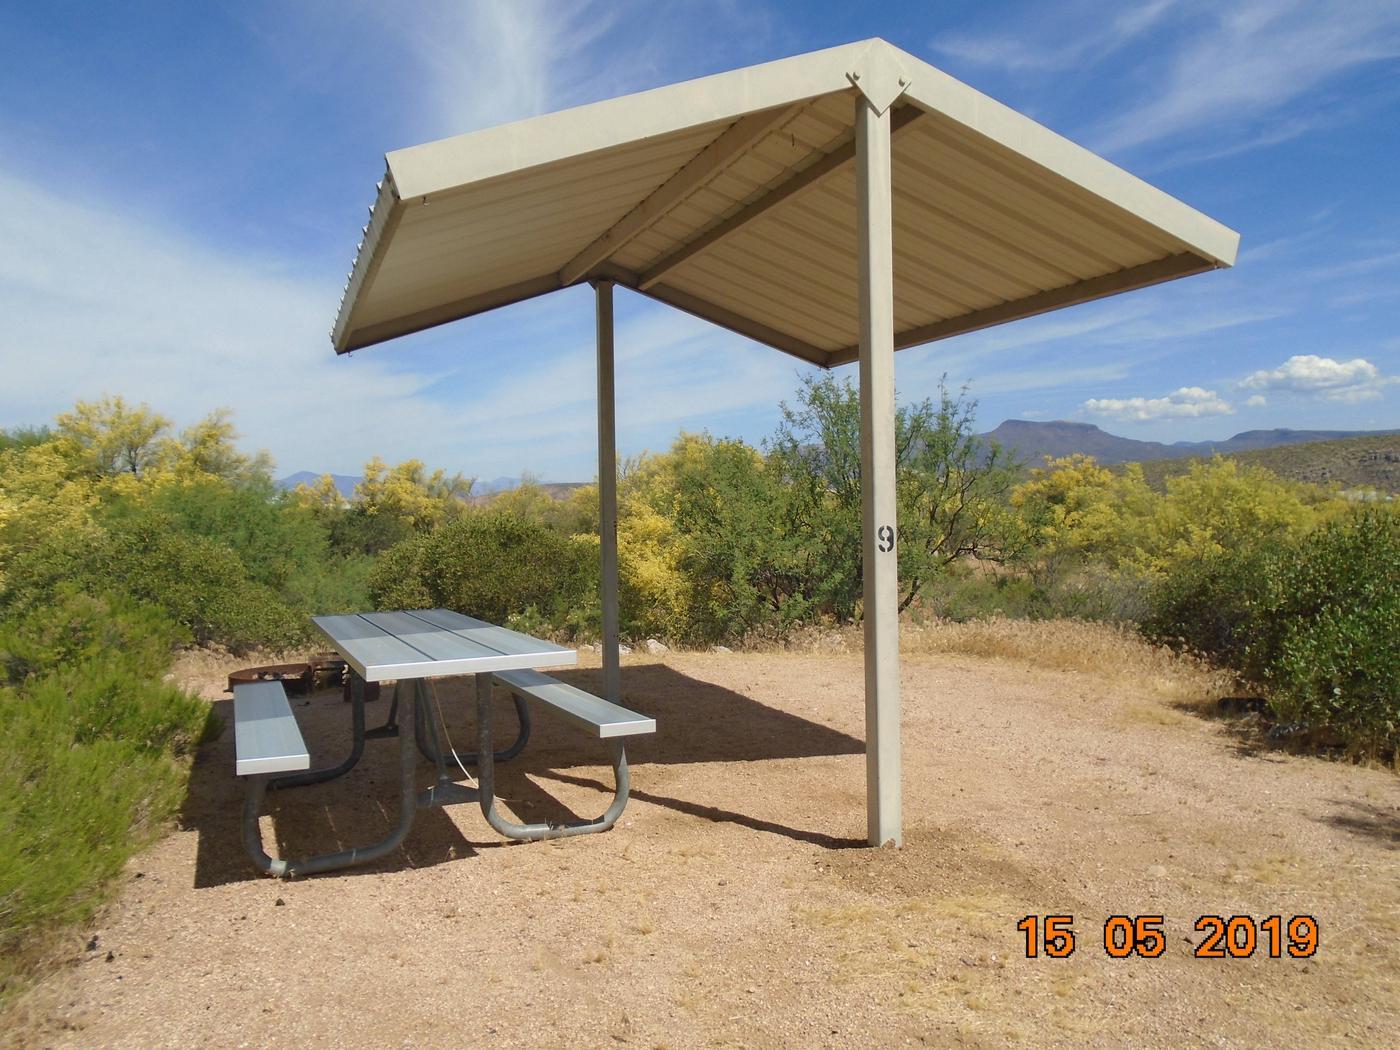 Campsite 9Windy Hill Campground